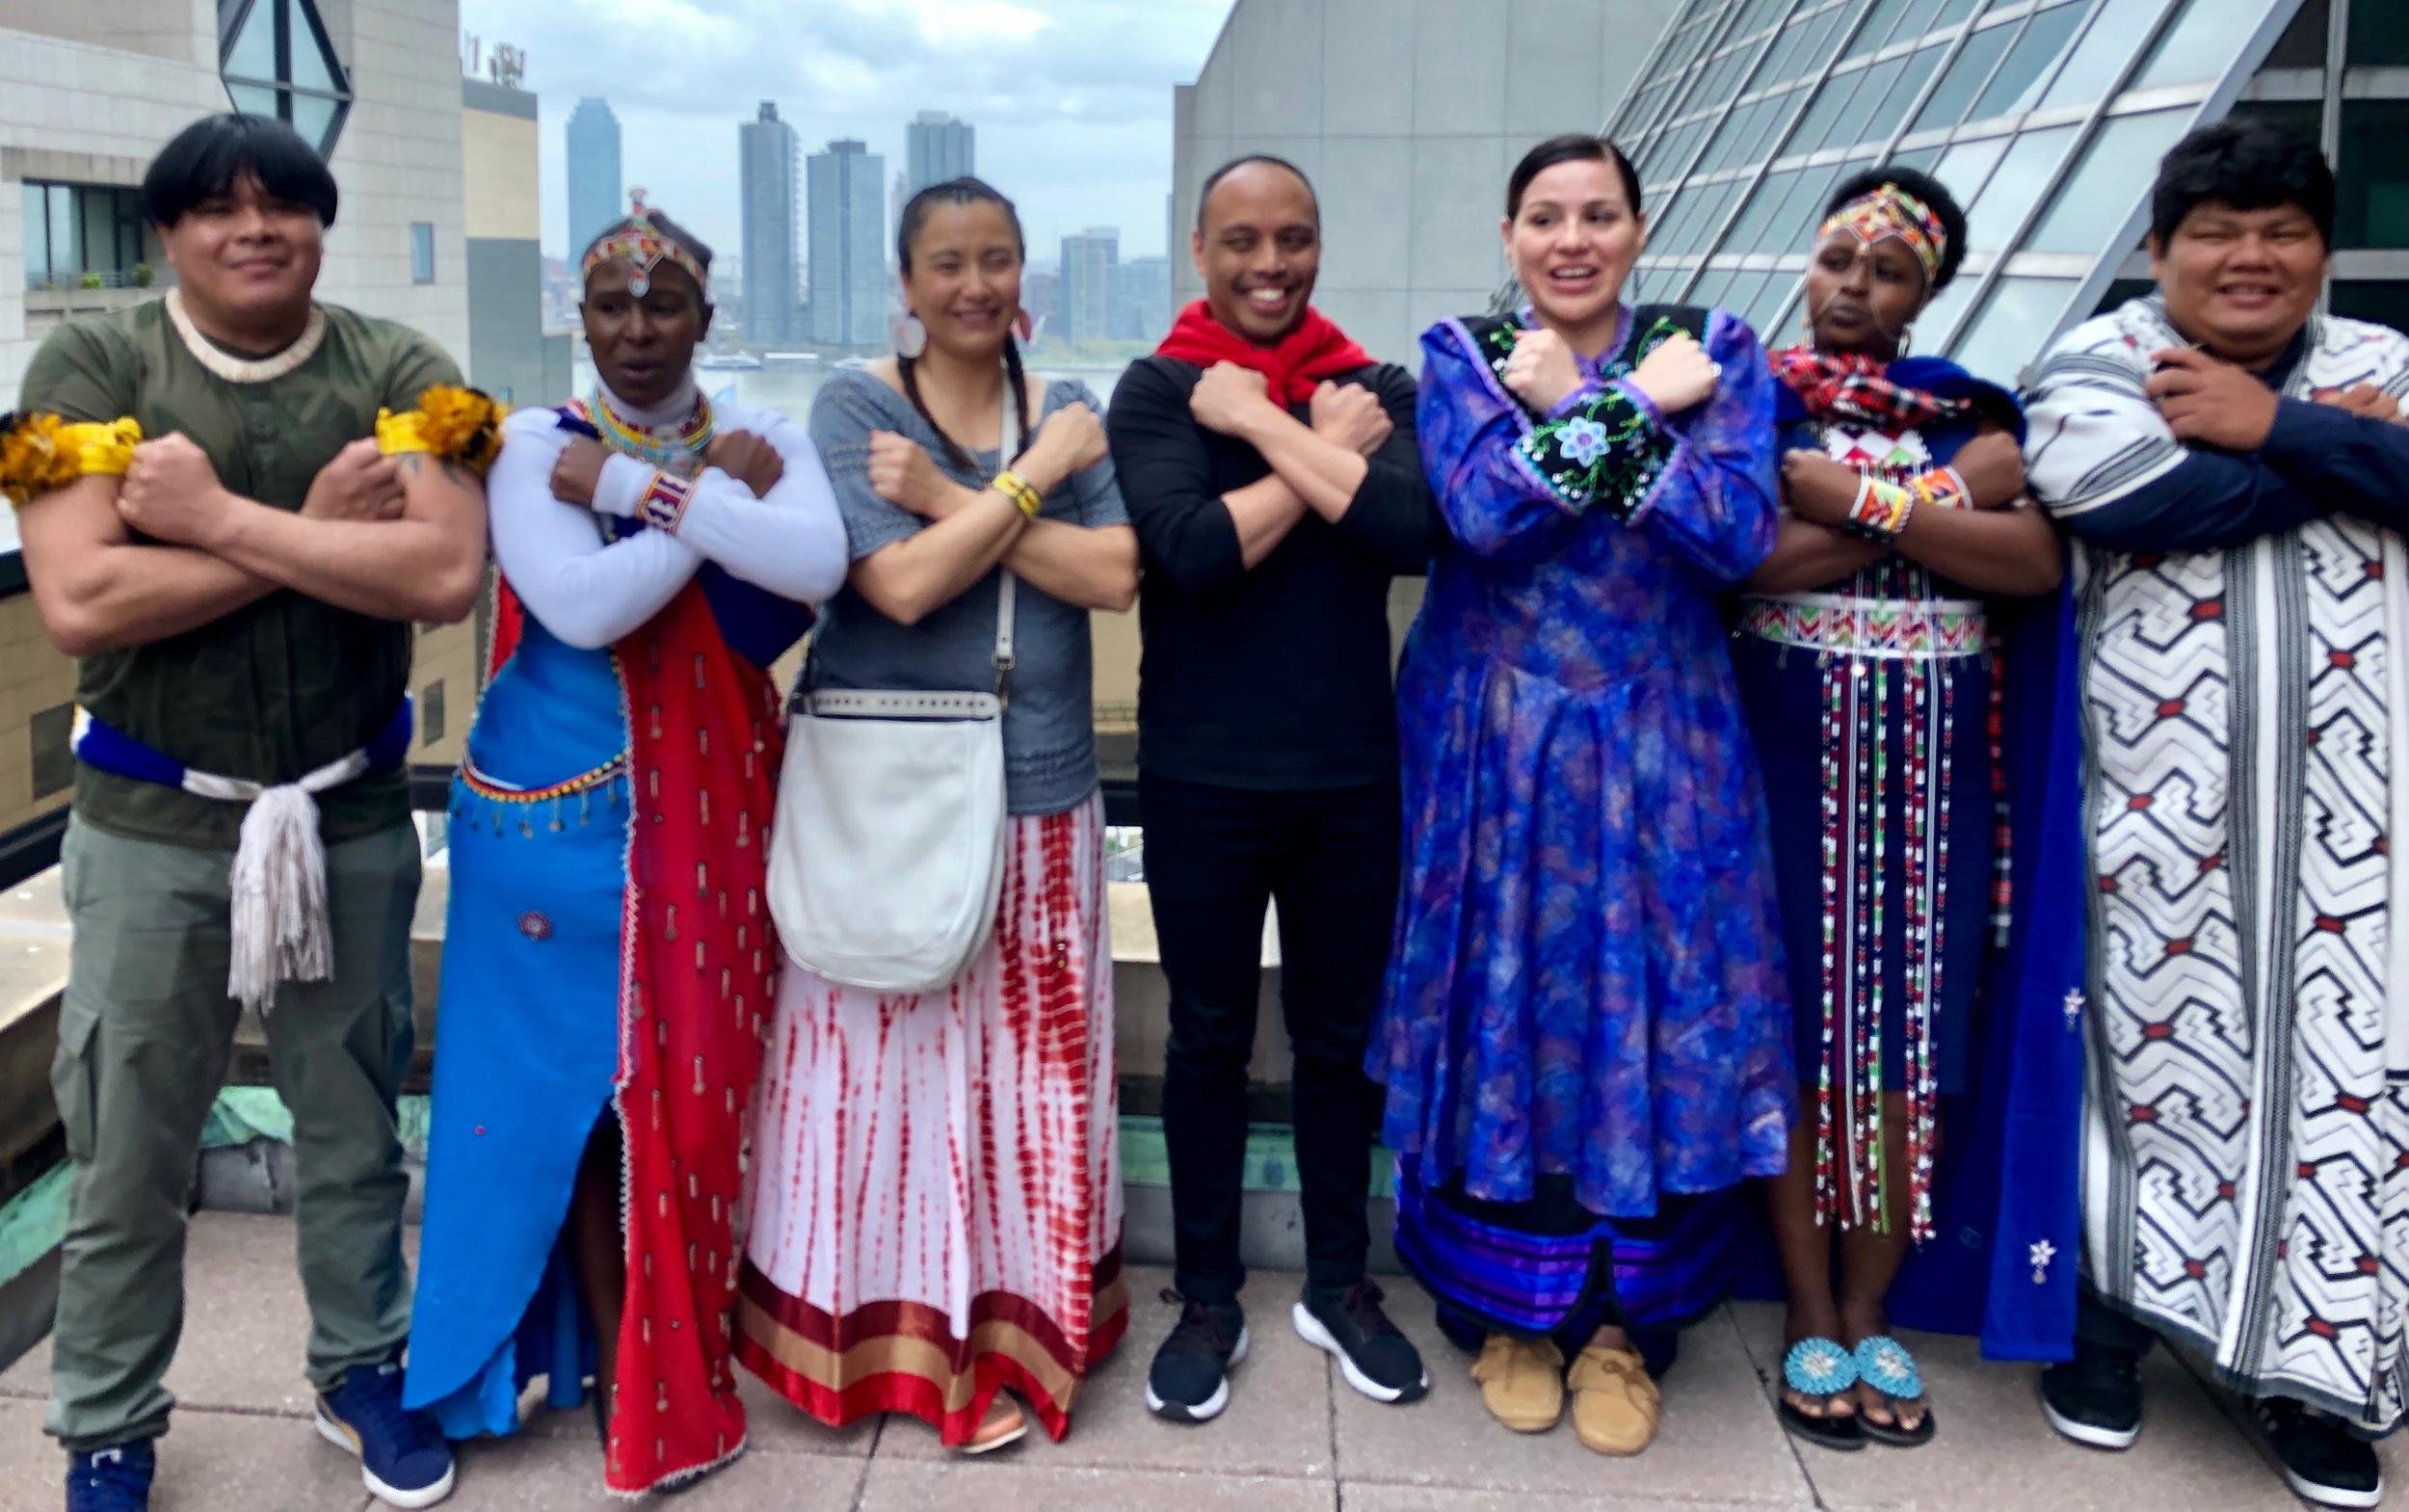 The Abolish Border Imperialism Intervention Group at the Project Access Training: From left to right - Aira Kamaiura, Nasianta Ene Meeli, Christine Nobiss, Karissa John, Ghazali Ohorella, Emily Lerosion, and Lucas Manchineri.